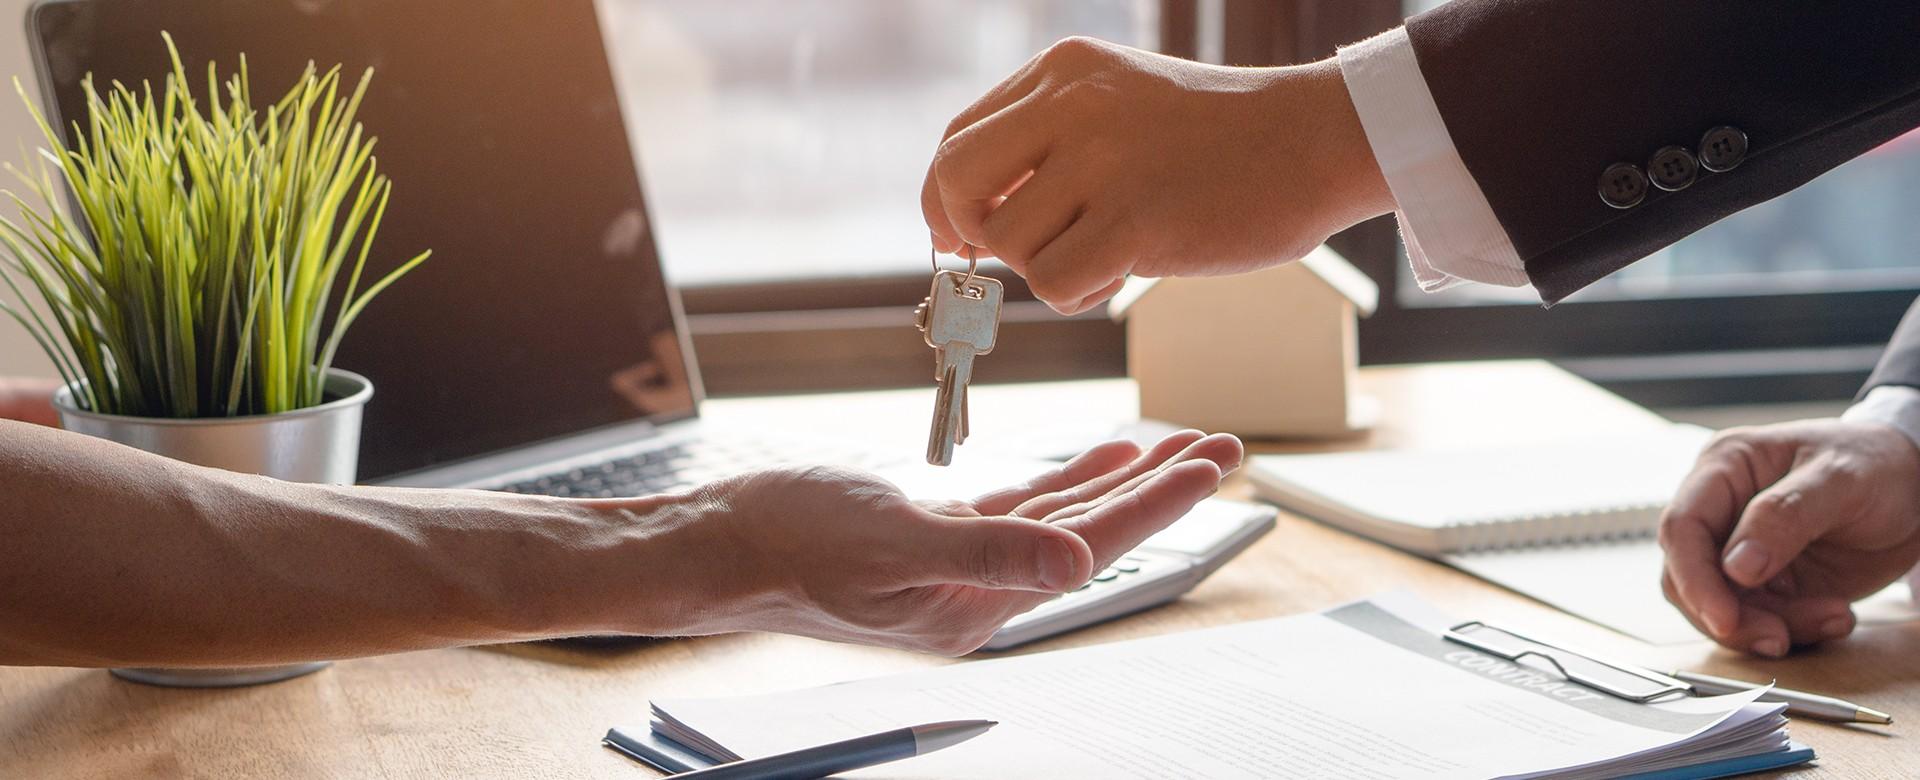 metier immobilier recrute